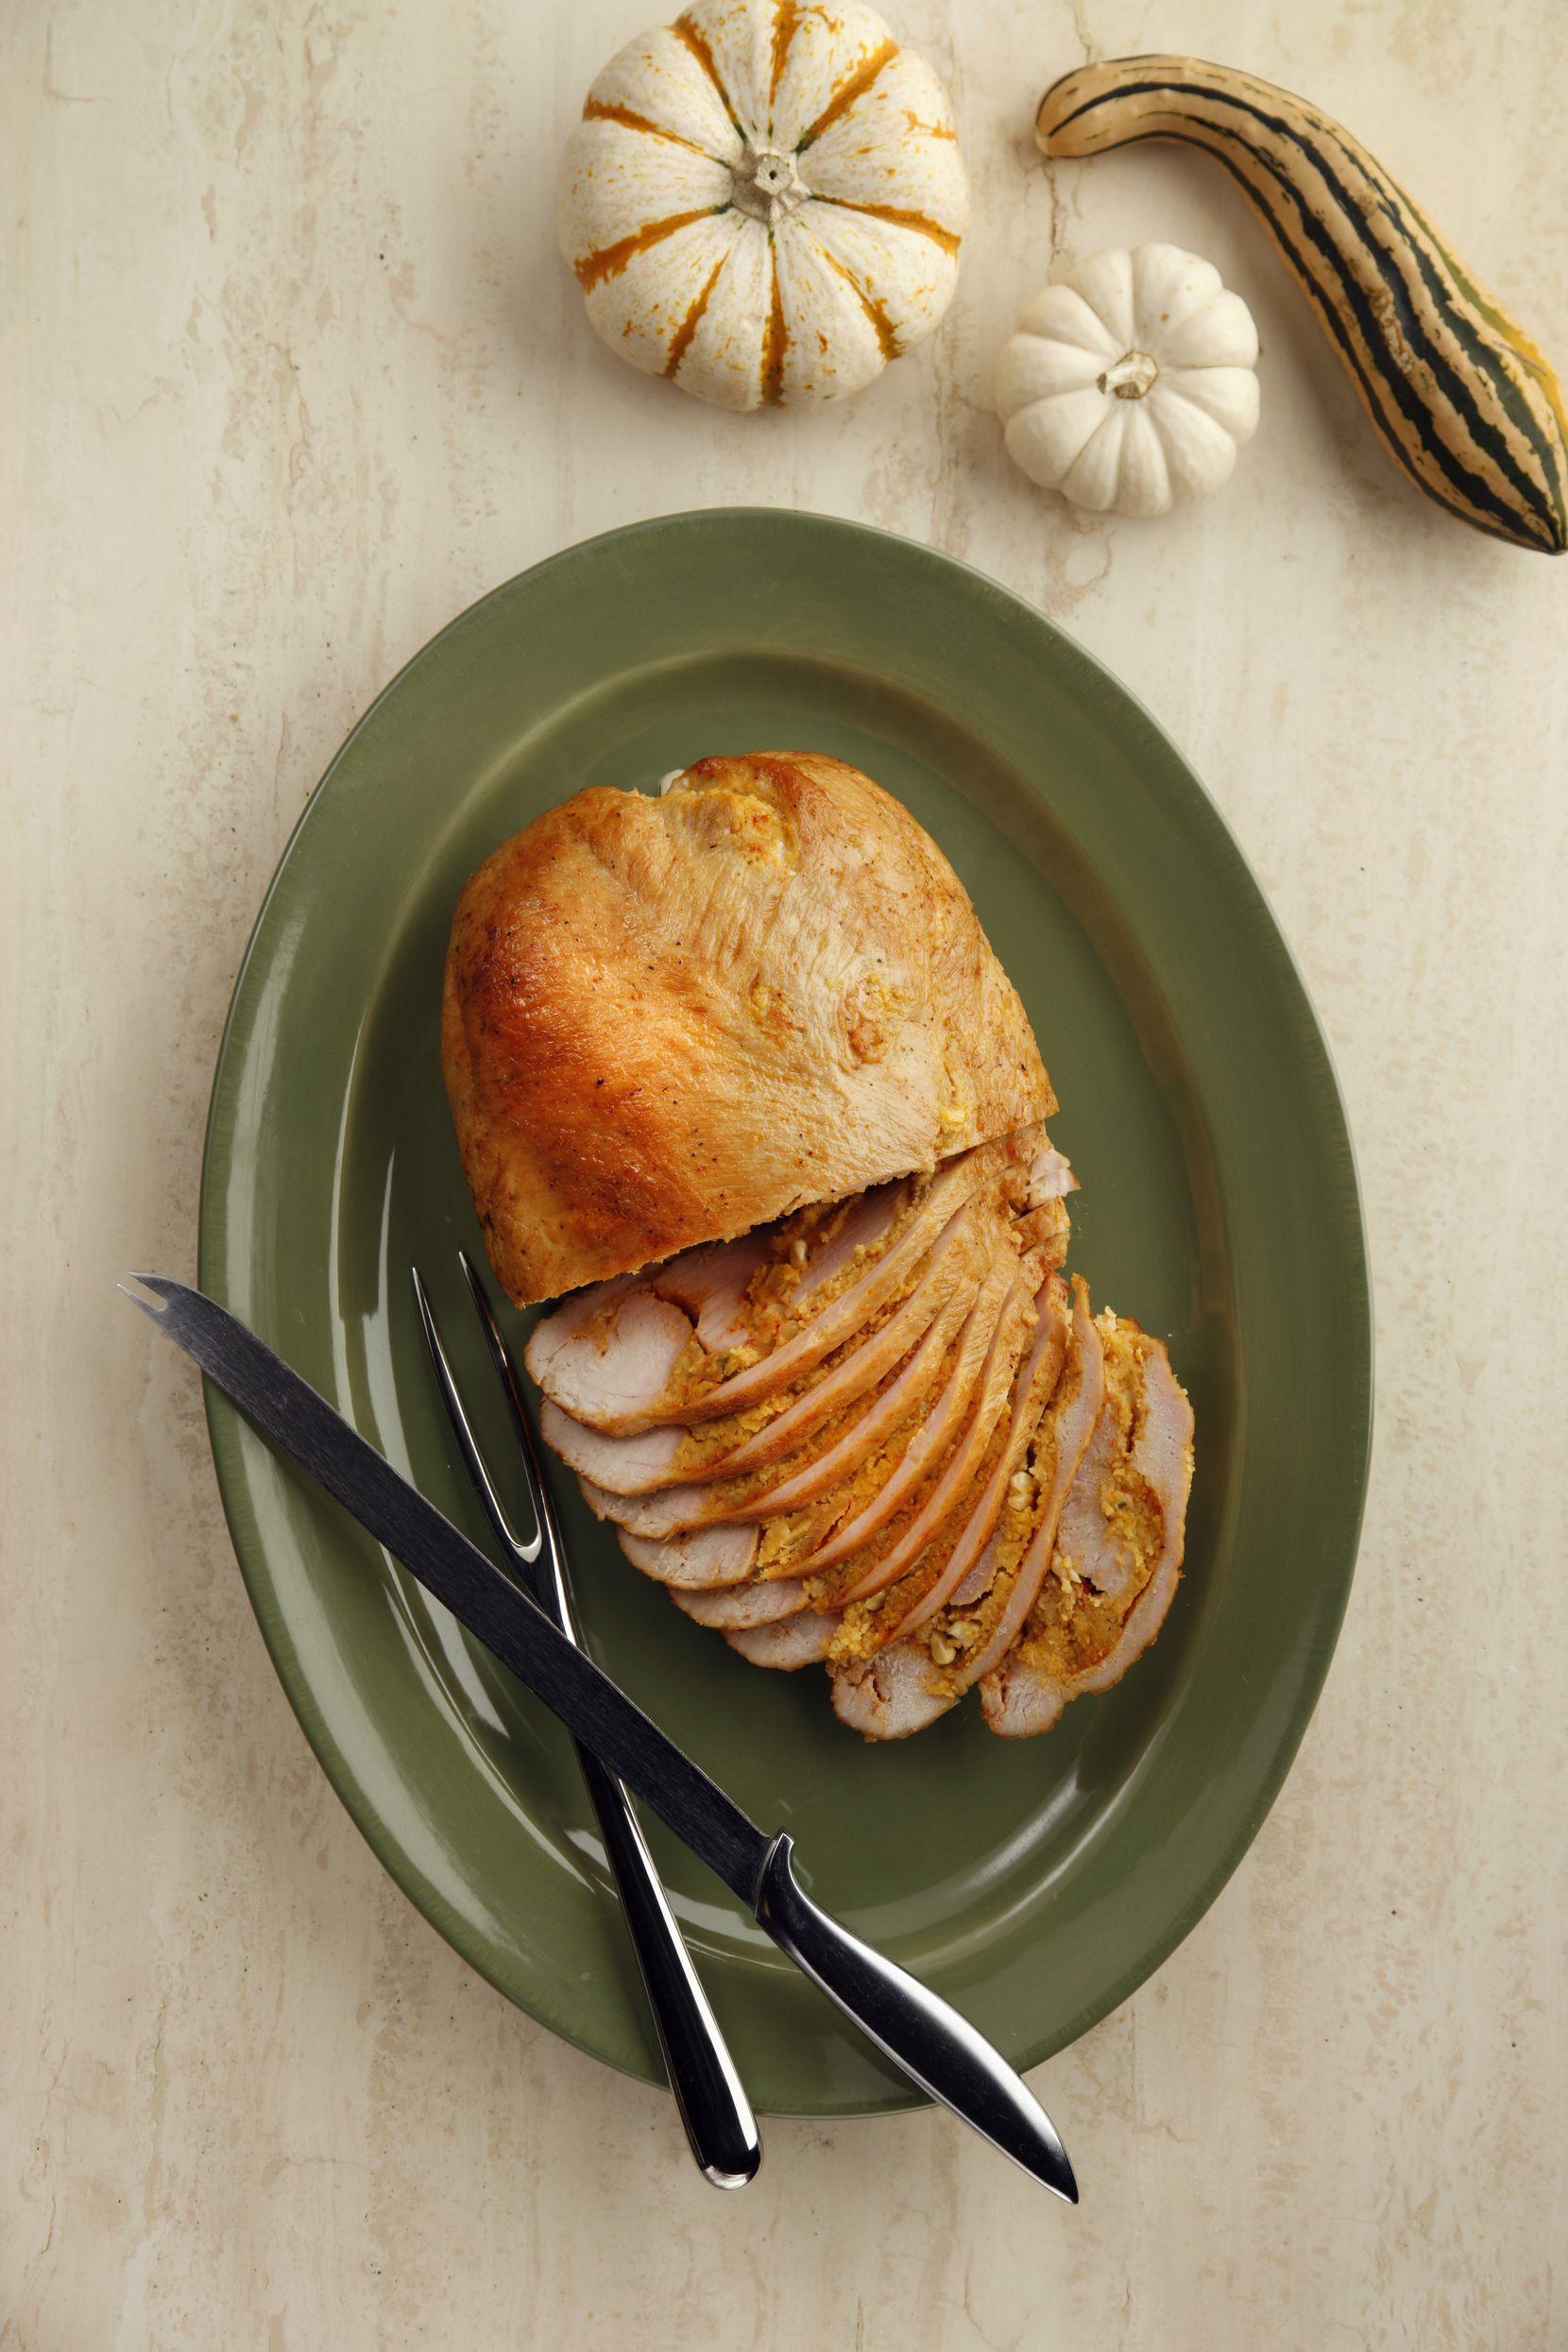 Turkey breasts marbled with crawfish cornbread or jalapeno cornbread from Cajun Turkey Co.